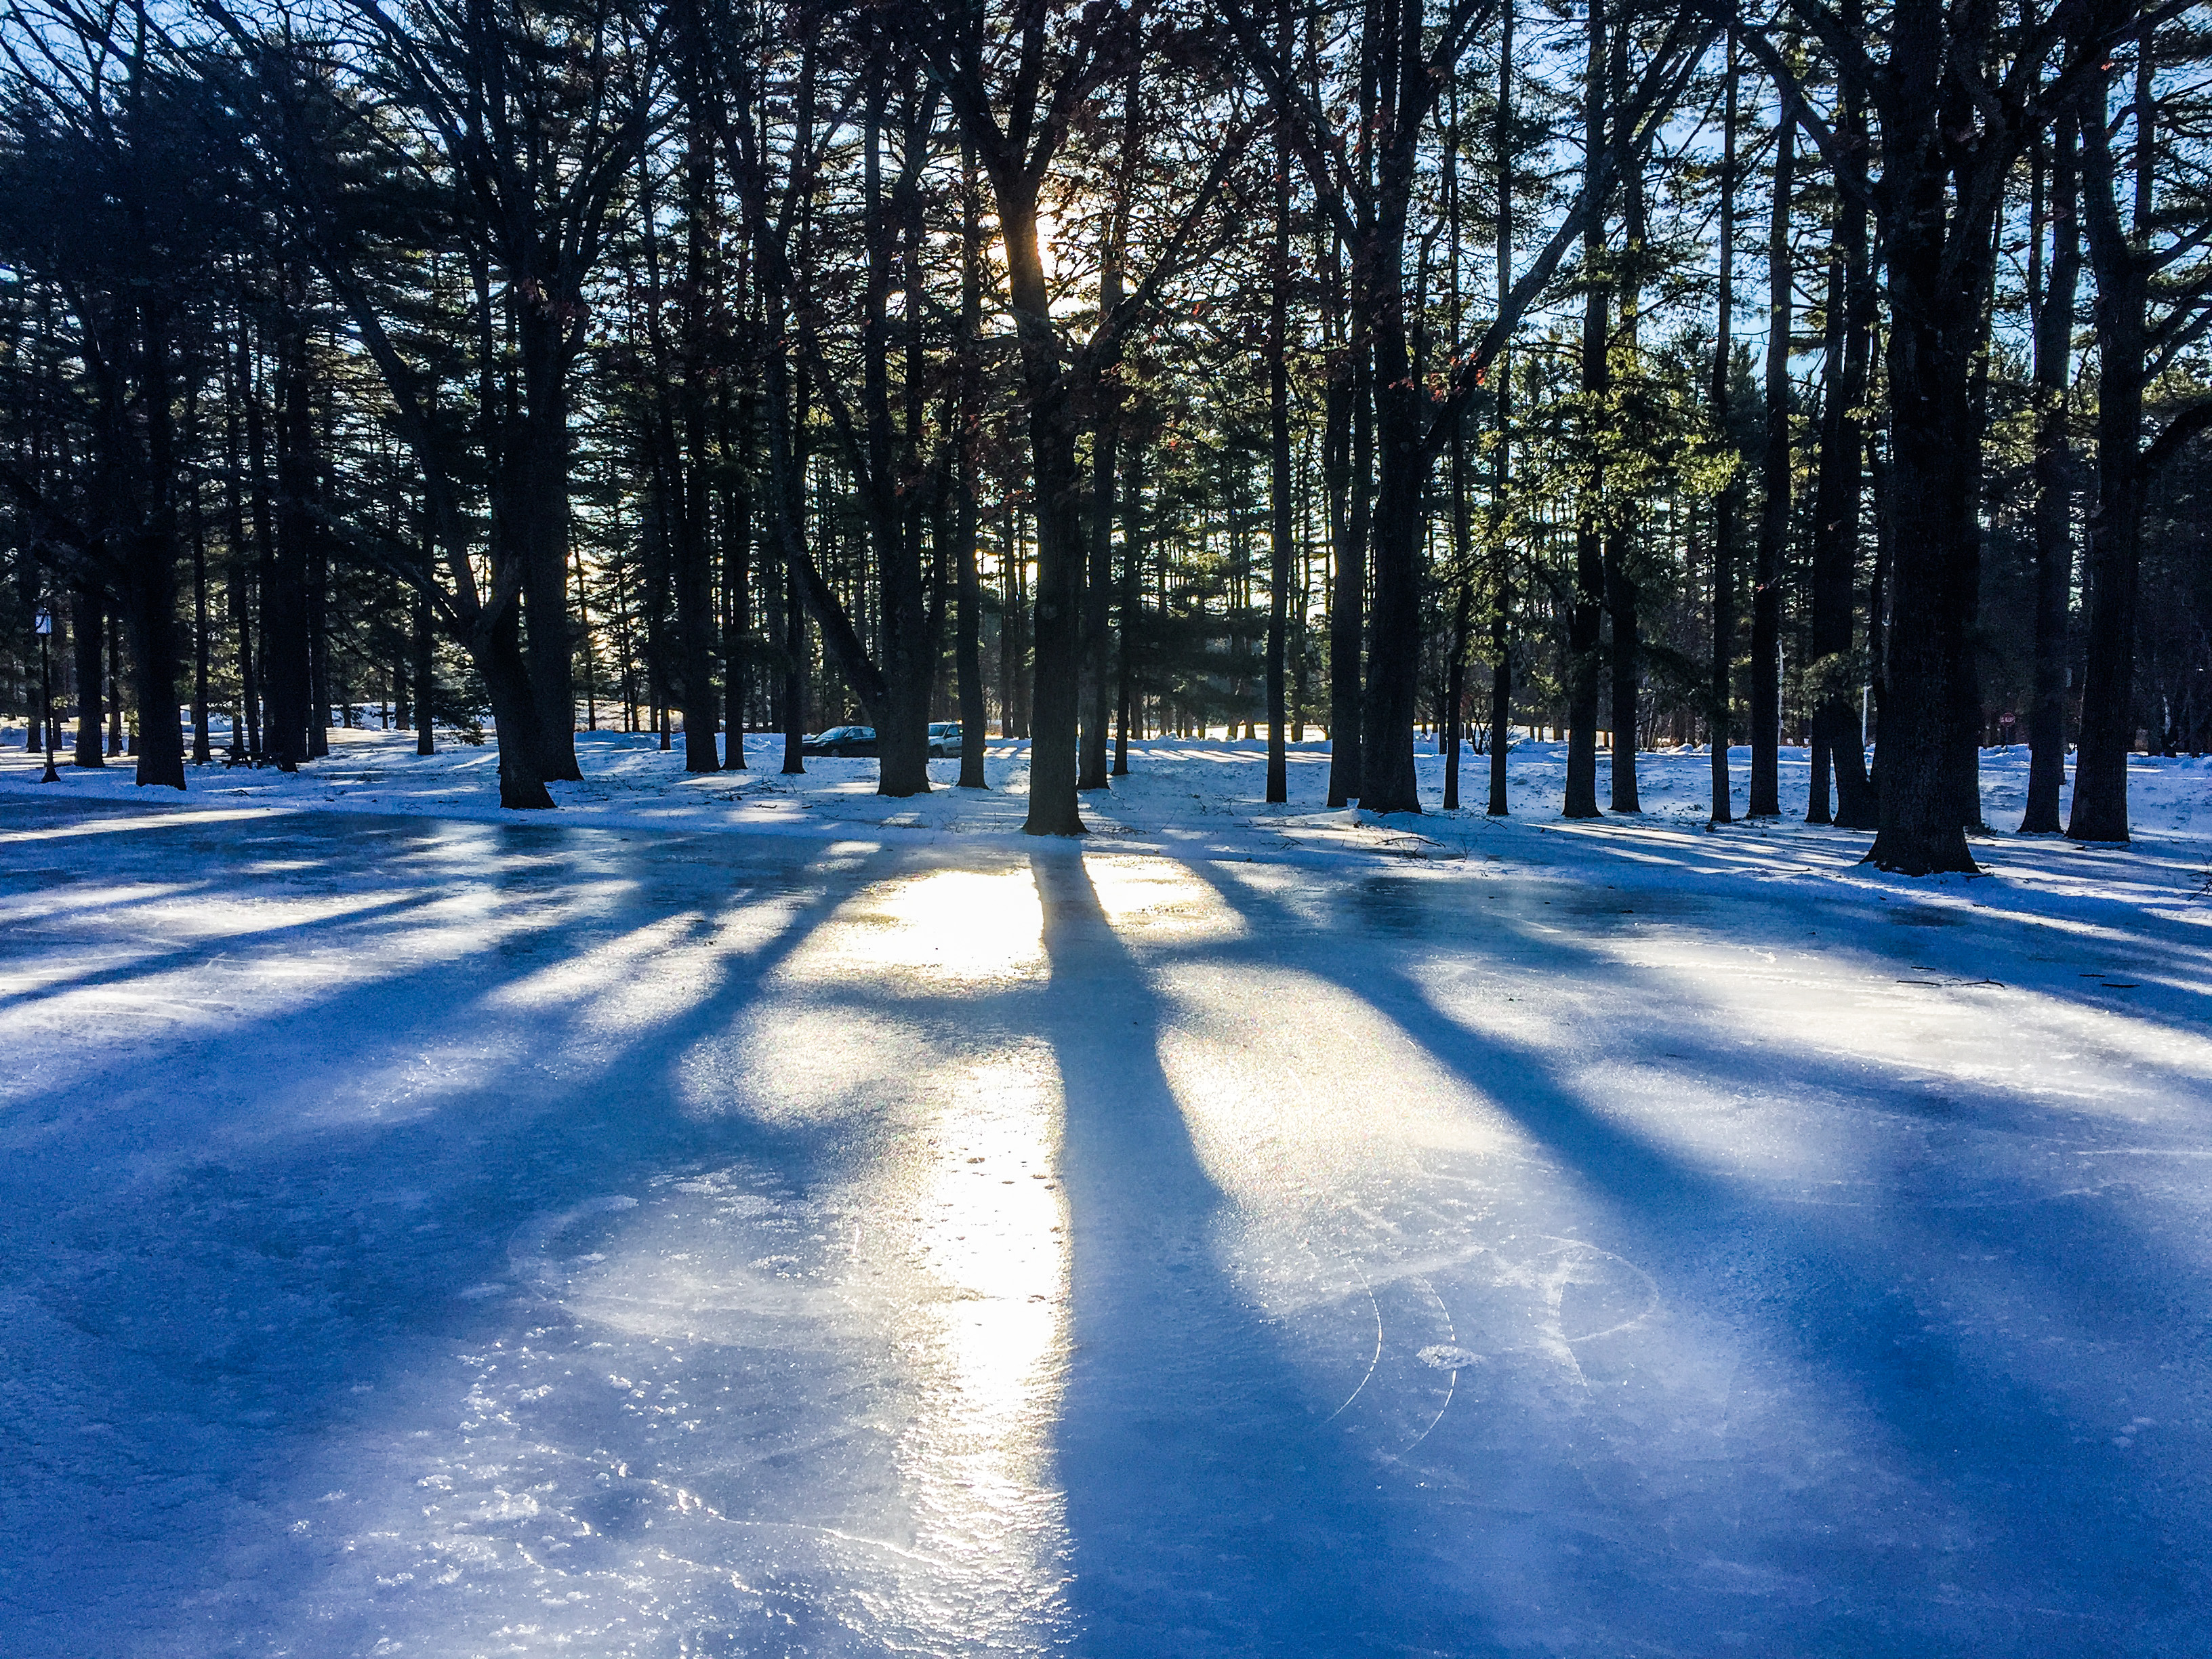 Saratoga Spa Park Ice Skating